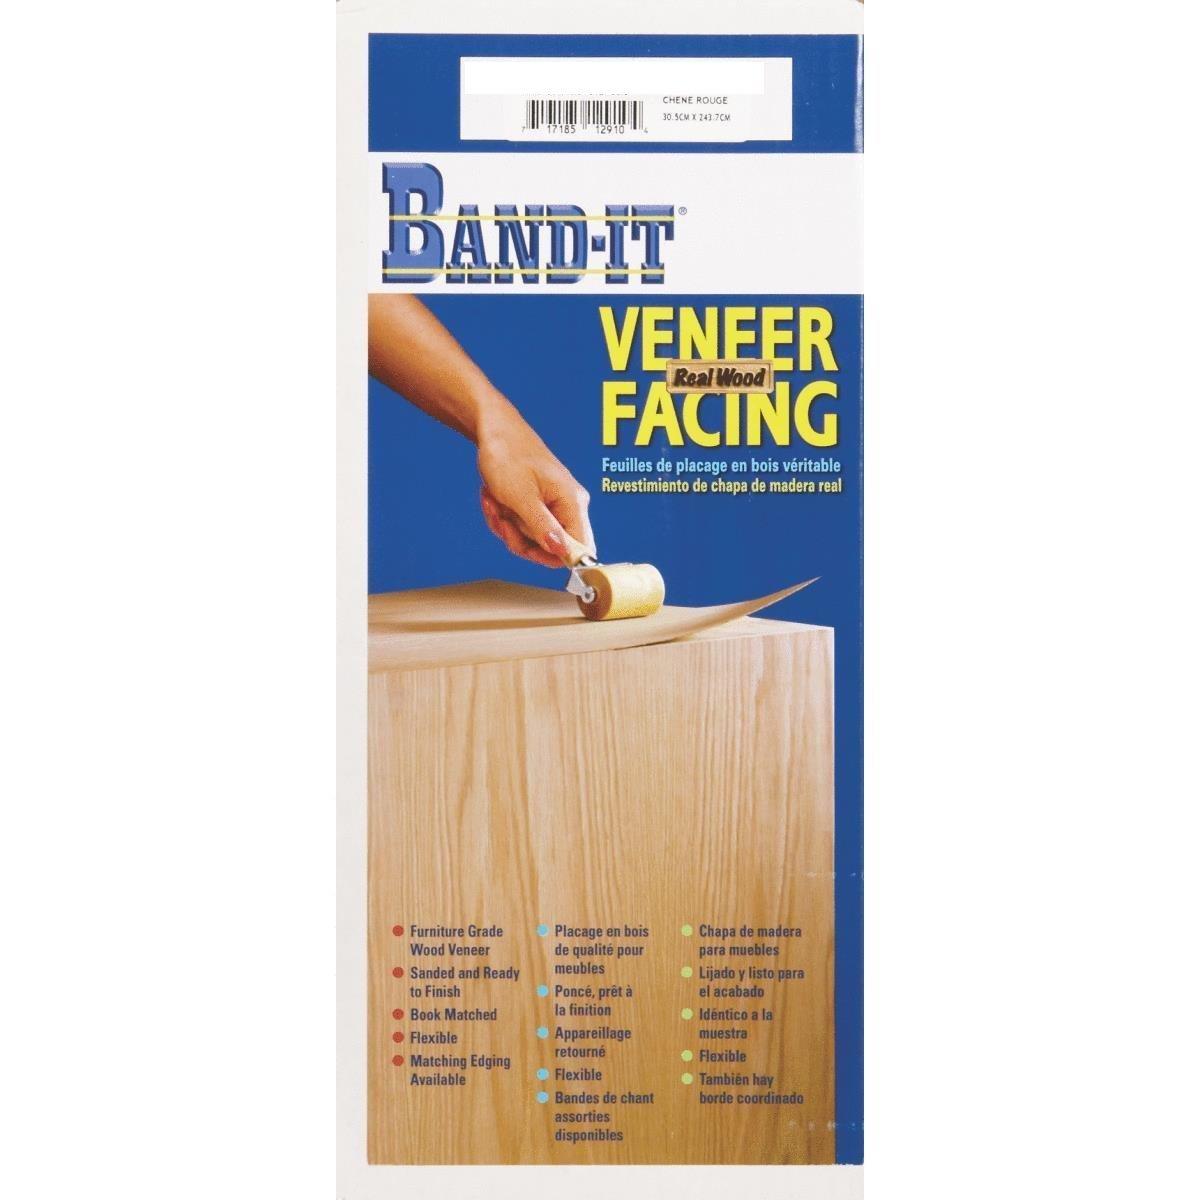 Band-It 24480 Paper Back Real Wood Veneer Facing, 24' x 48', Carolina Pine 24 x 48